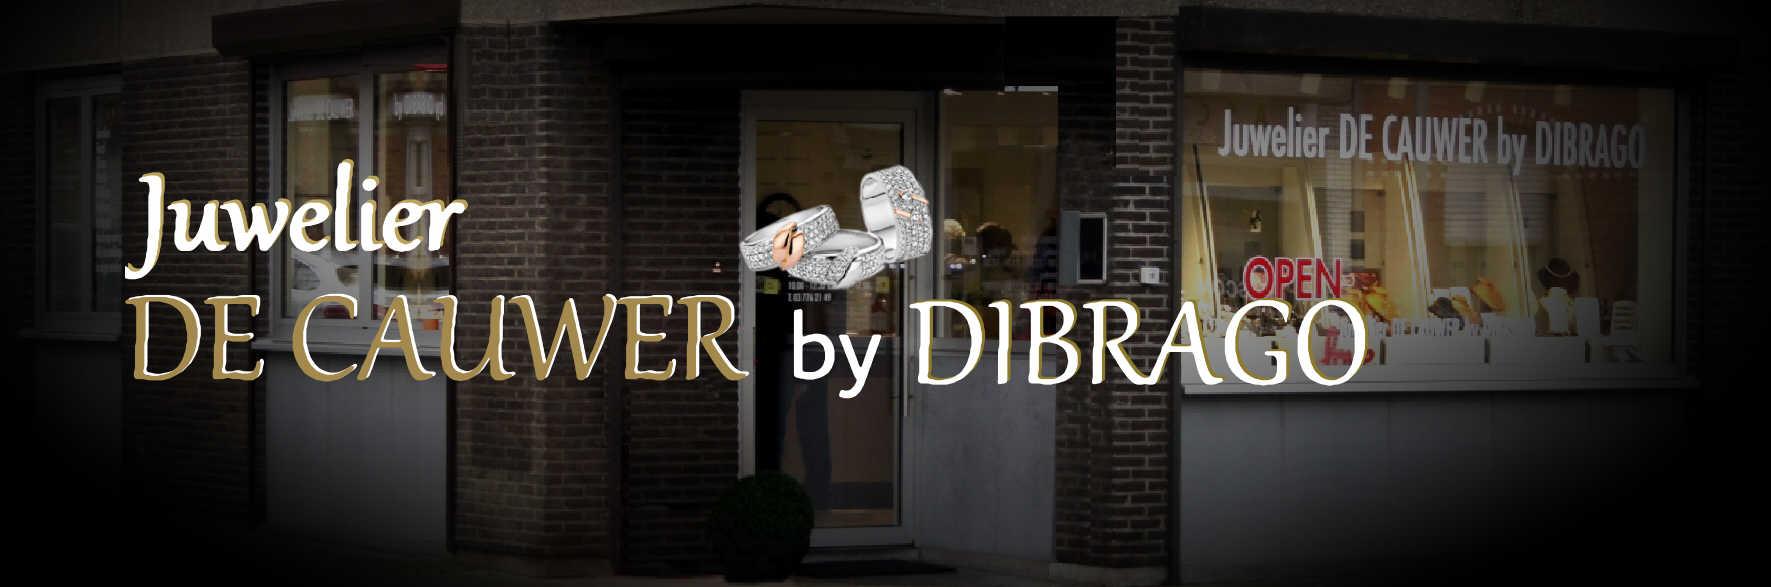 Juwelier De Cauwer by Dibrago